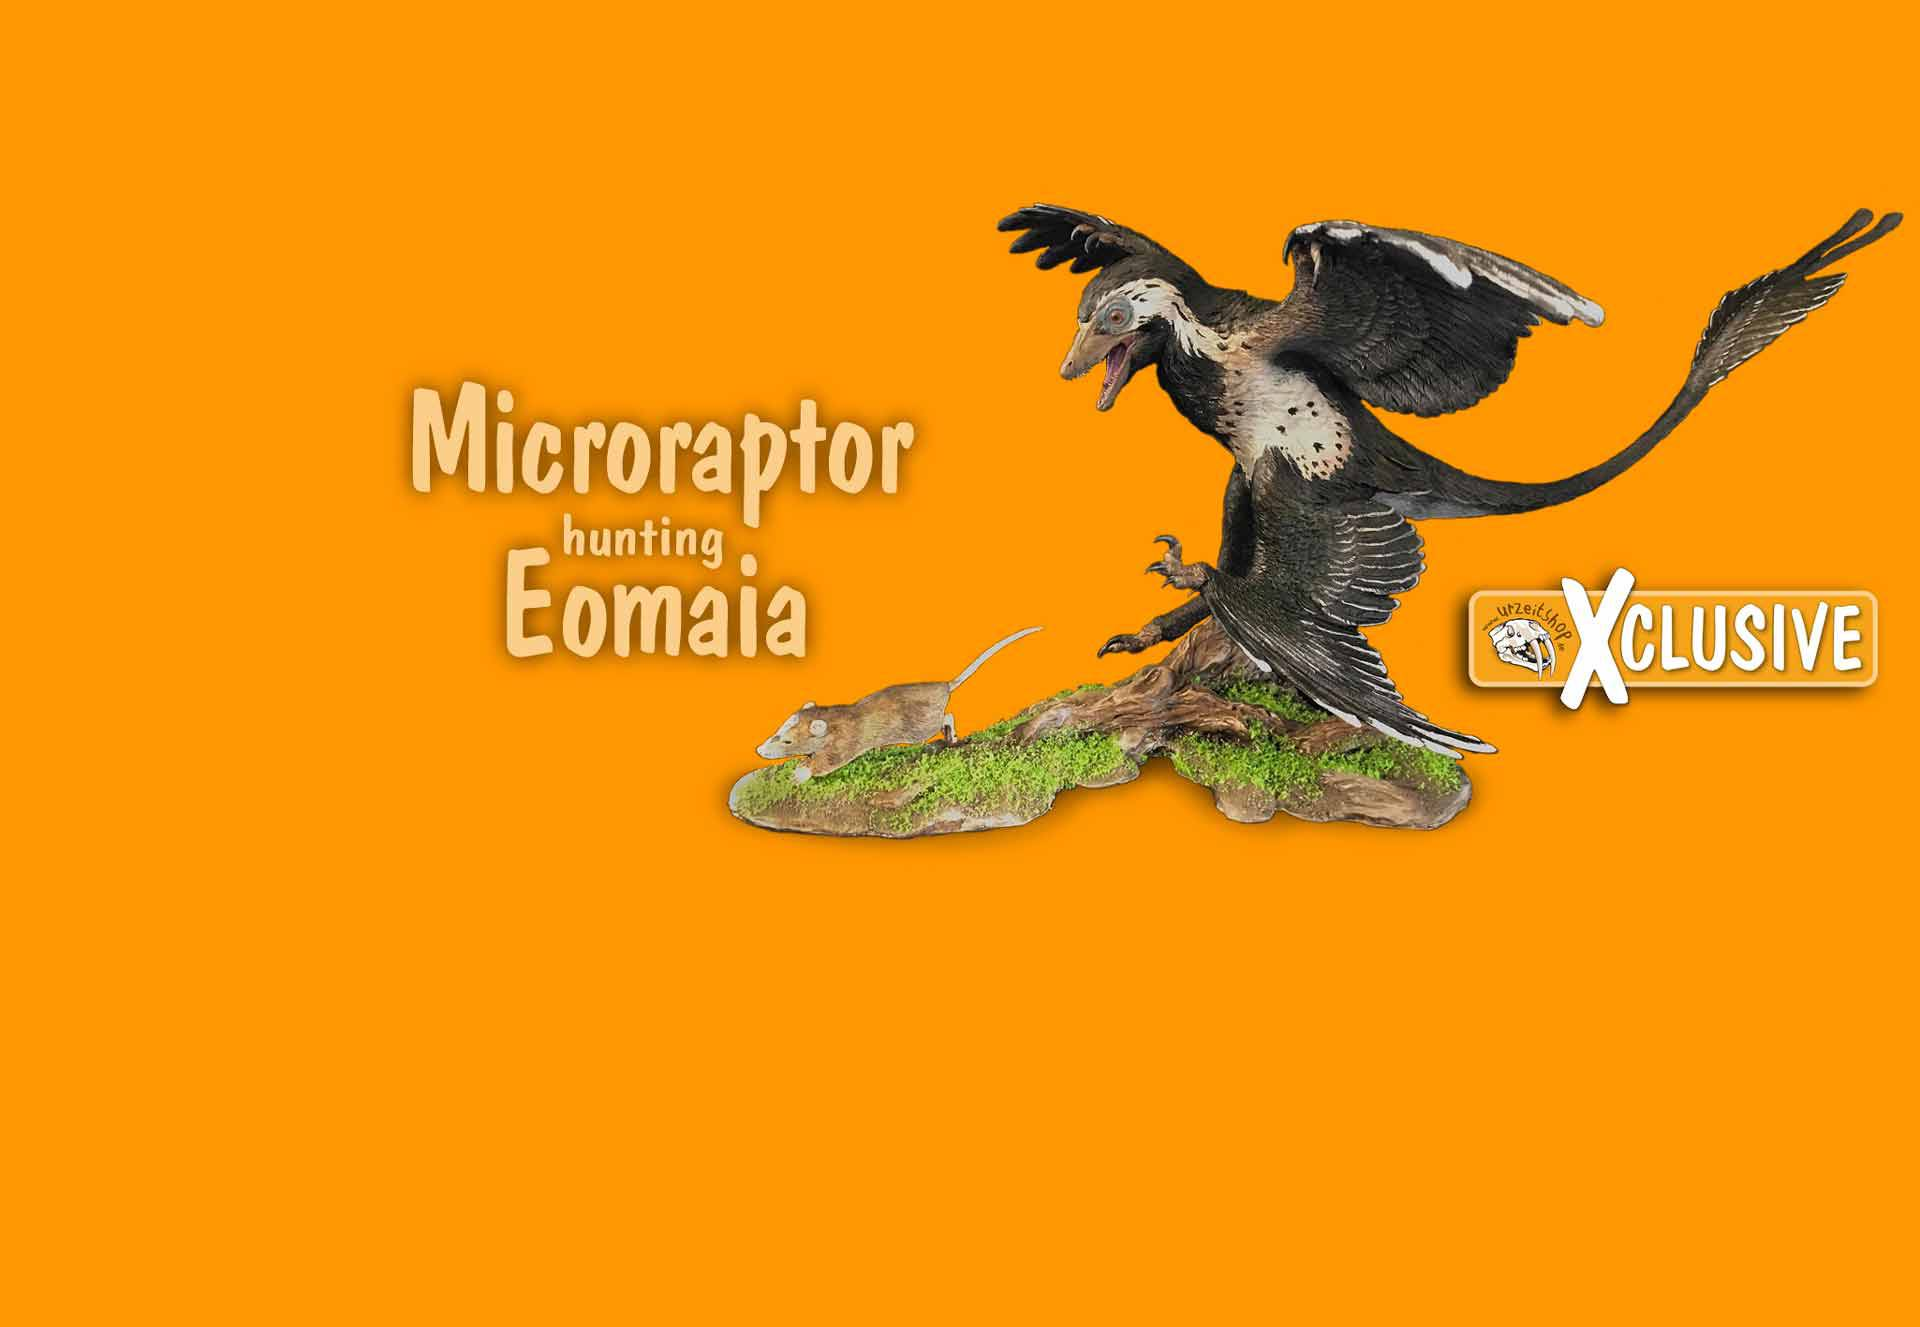 Microraptor hunting Eomaia